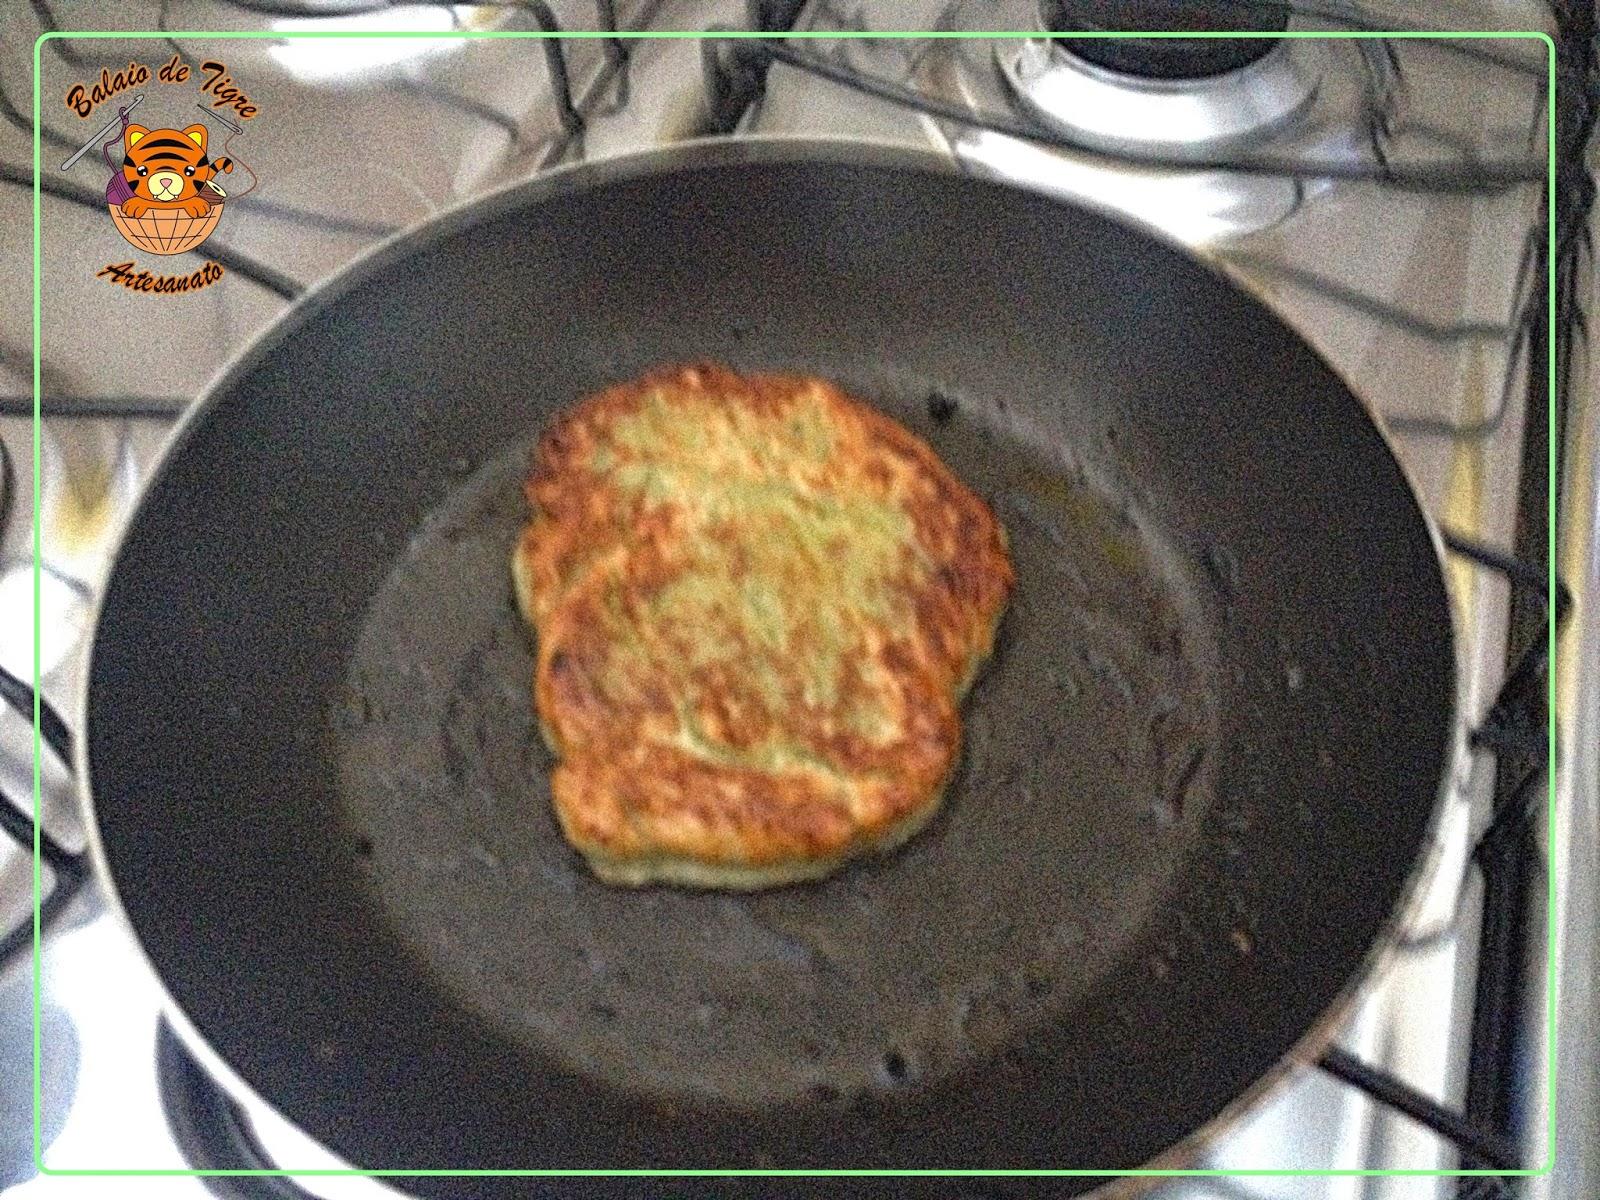 receita de hamburguer vegano de pepino balaio de tigre artesanato